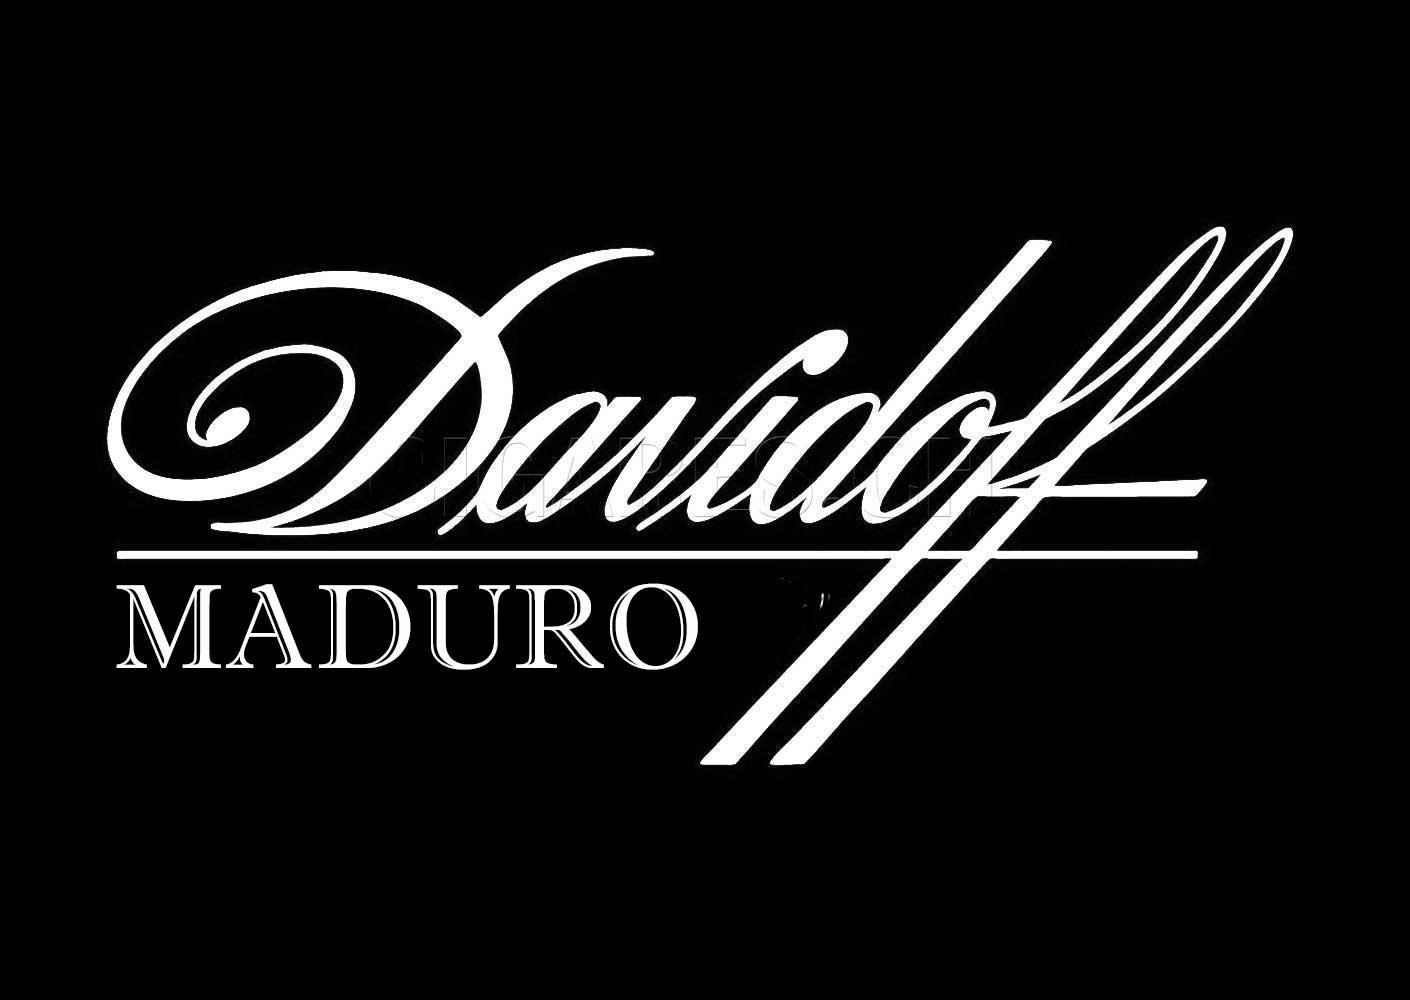 Cigares Davidoff Maduro logo